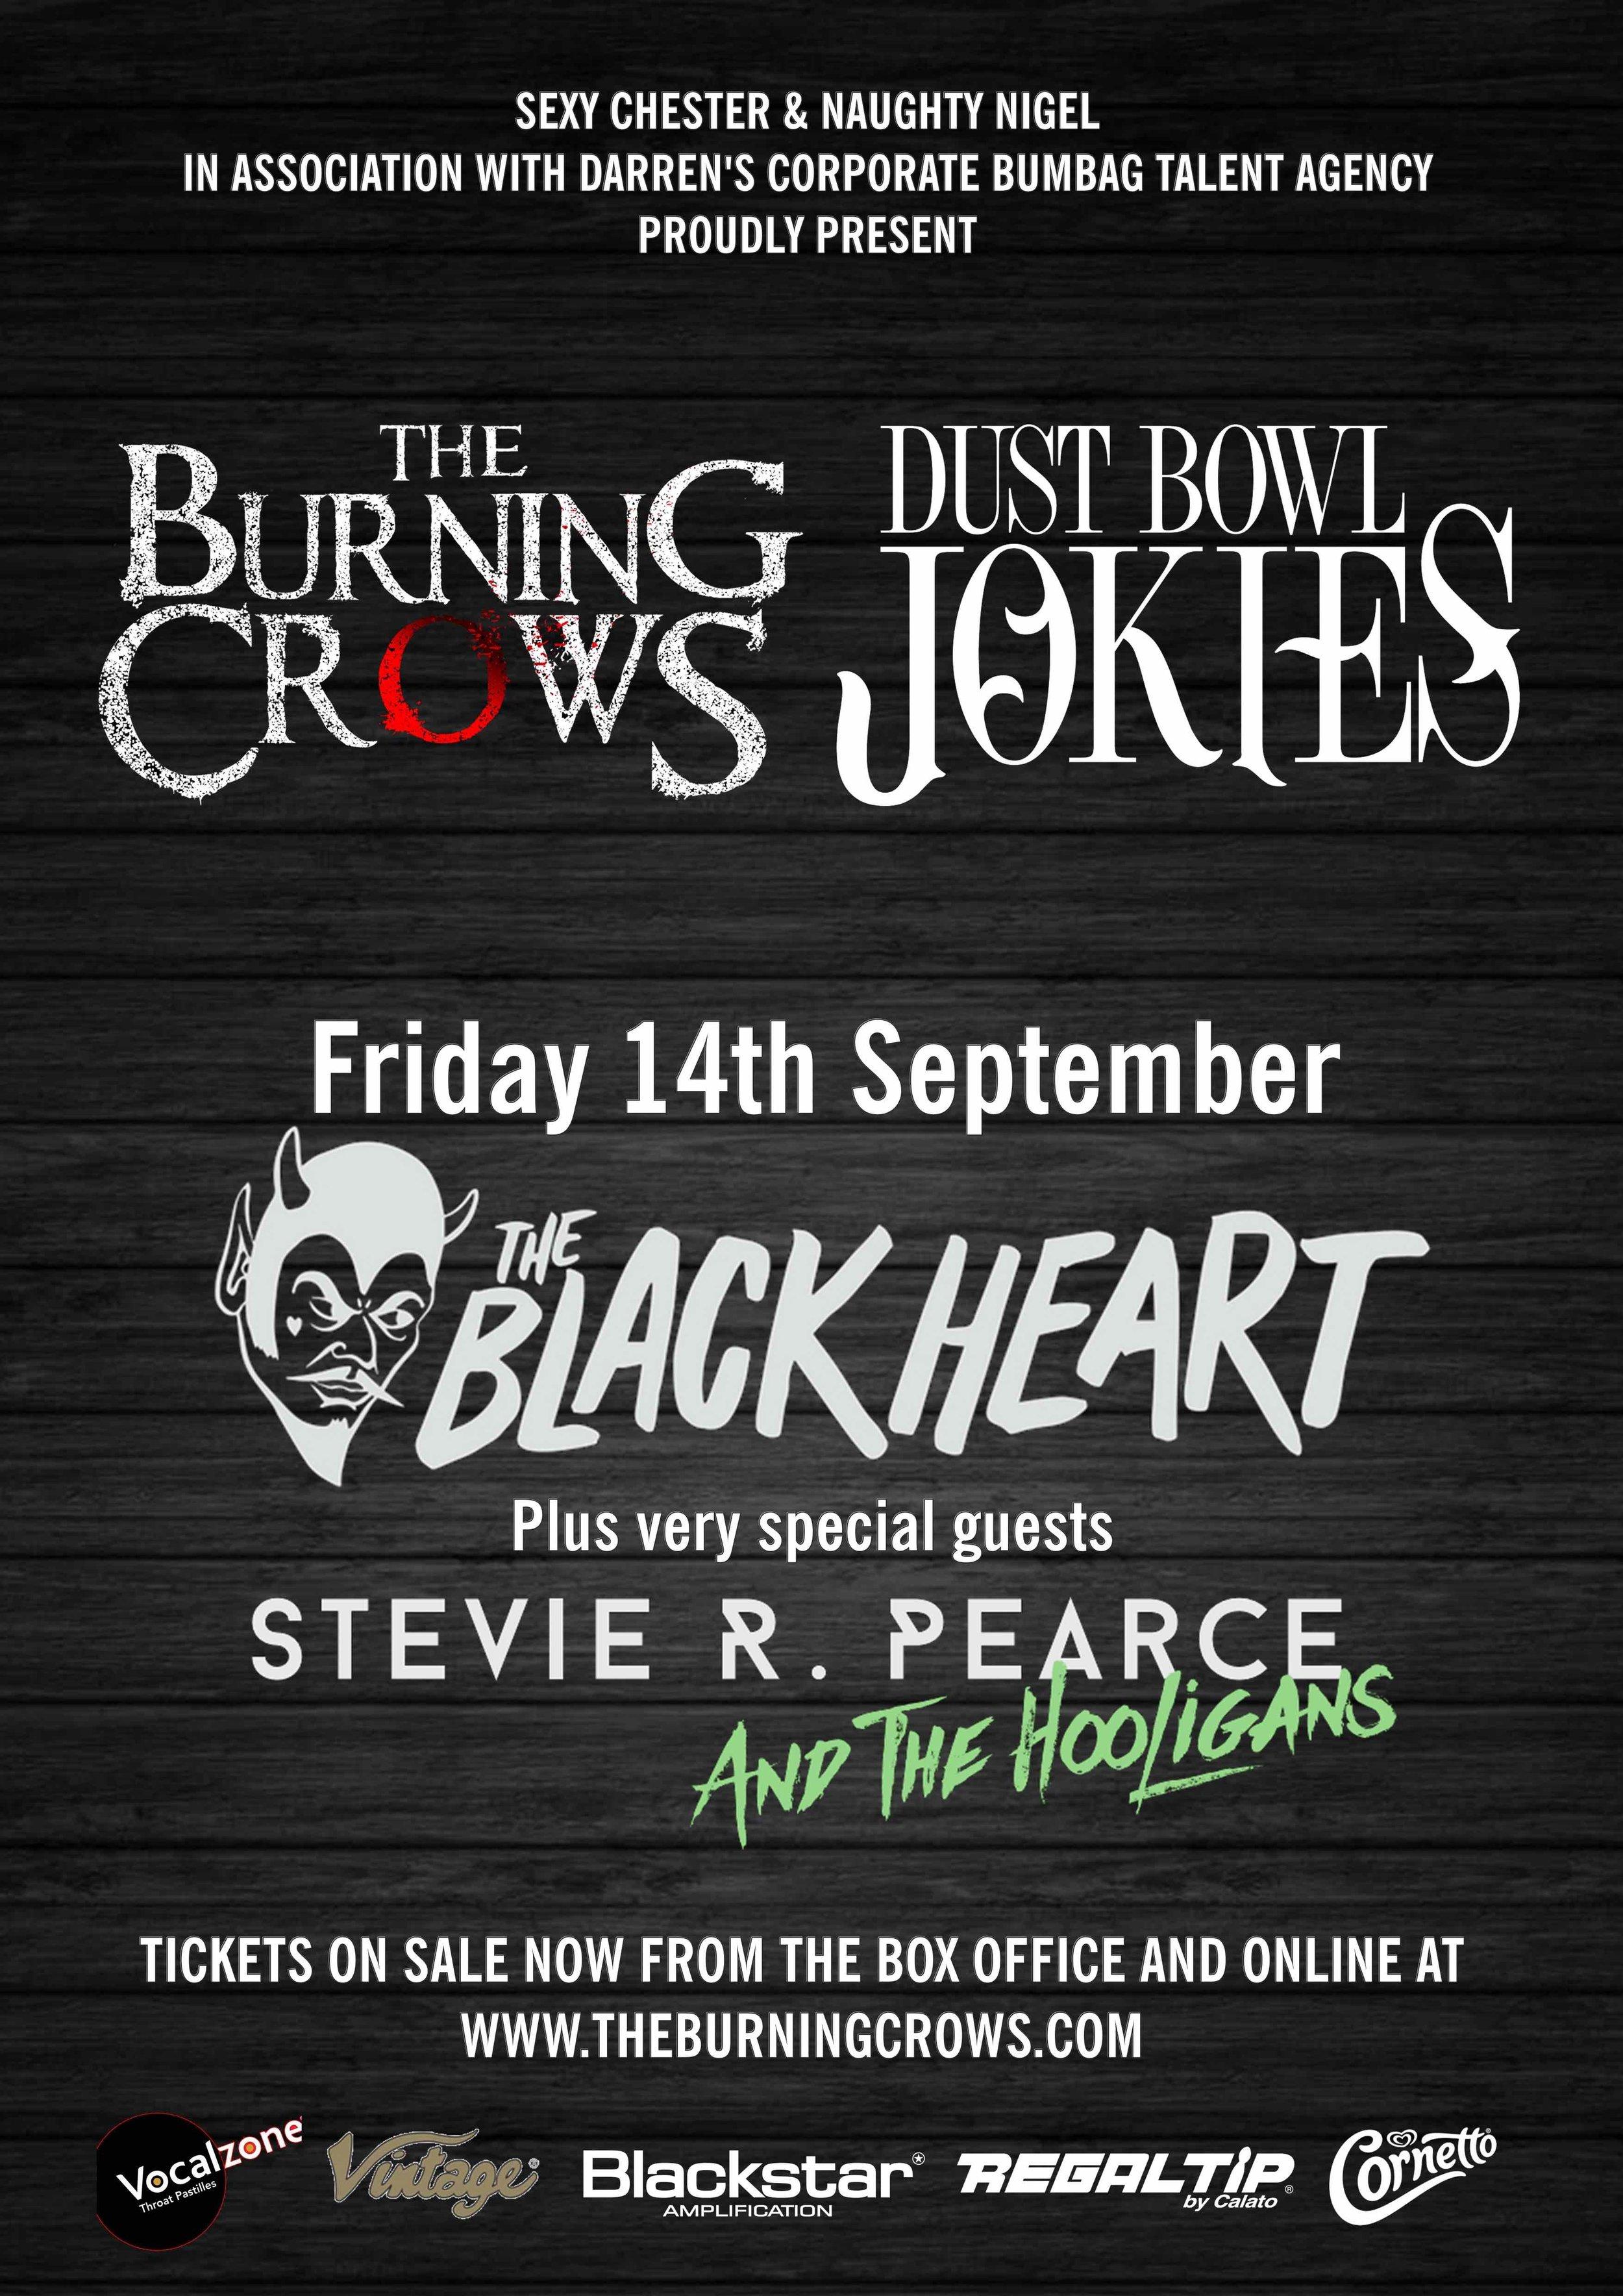 TBC & DBJ Live Sep 2018 Tour Poster - 14.9.18 London.jpg